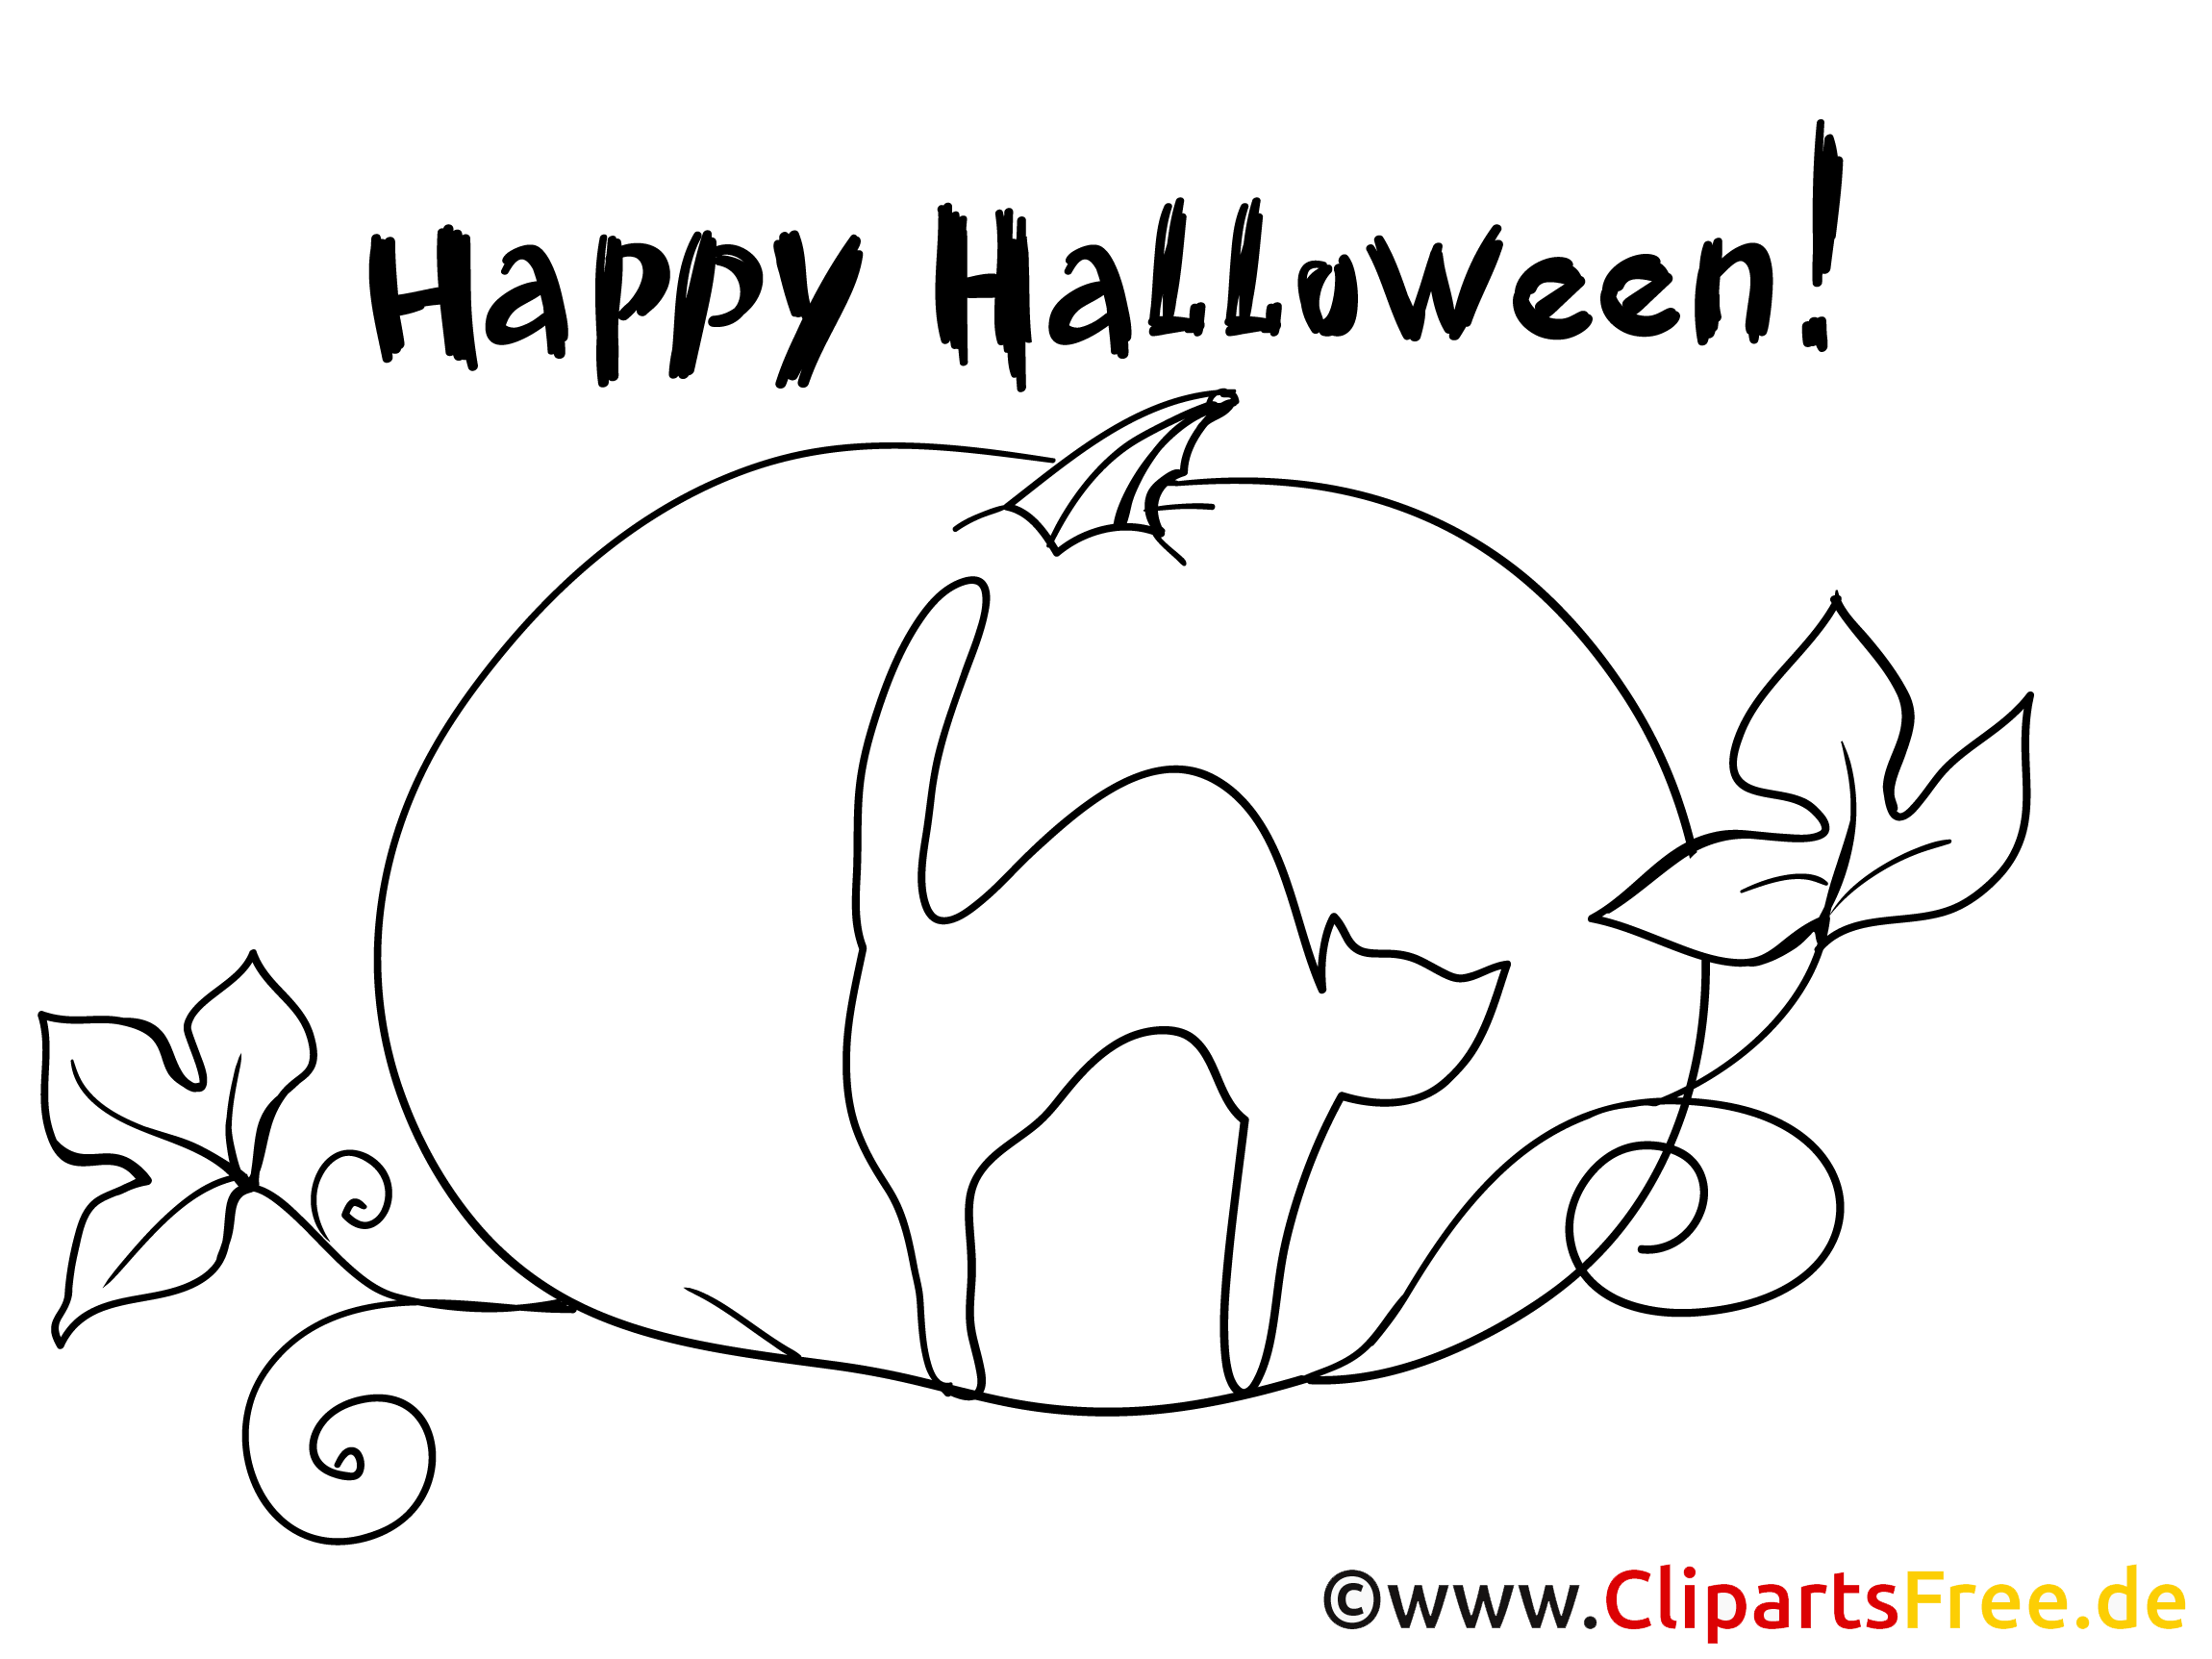 Malbilder zu Halloween